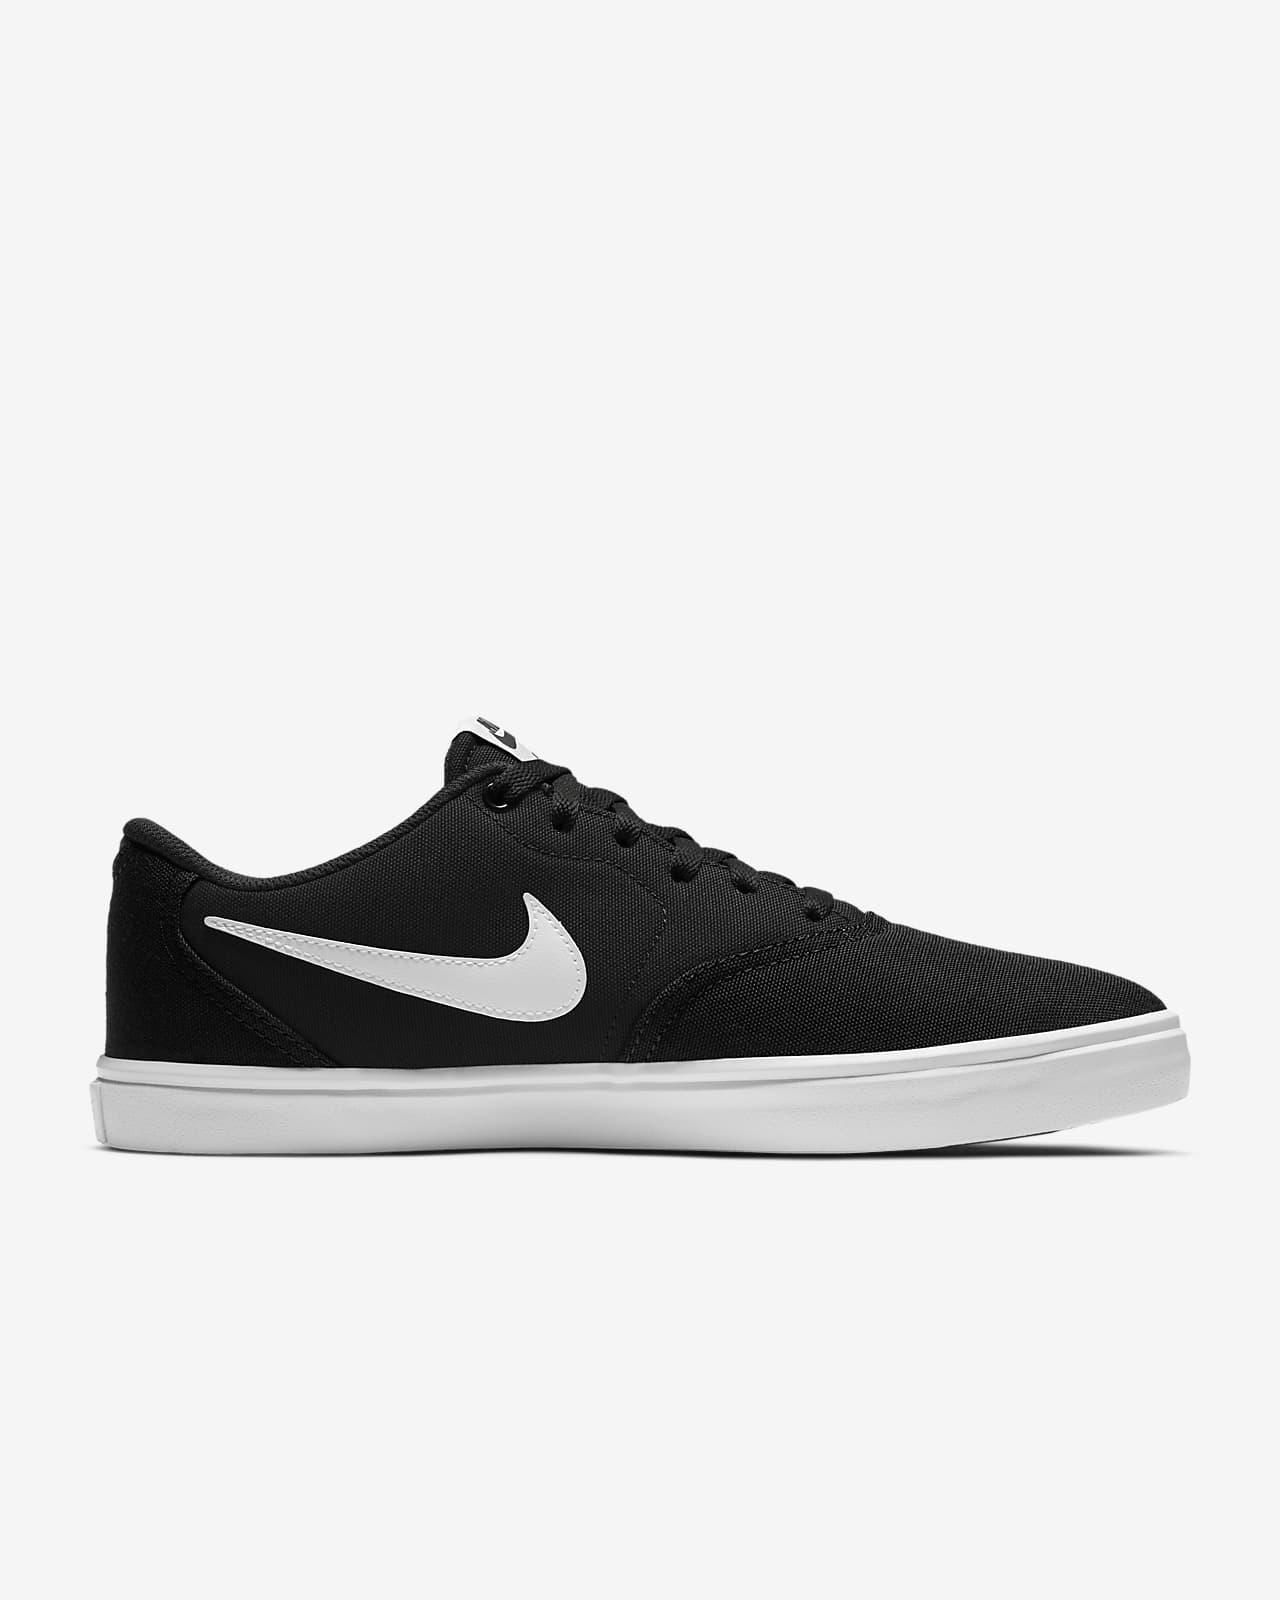 Soldes > chaussure nike sb > en stock